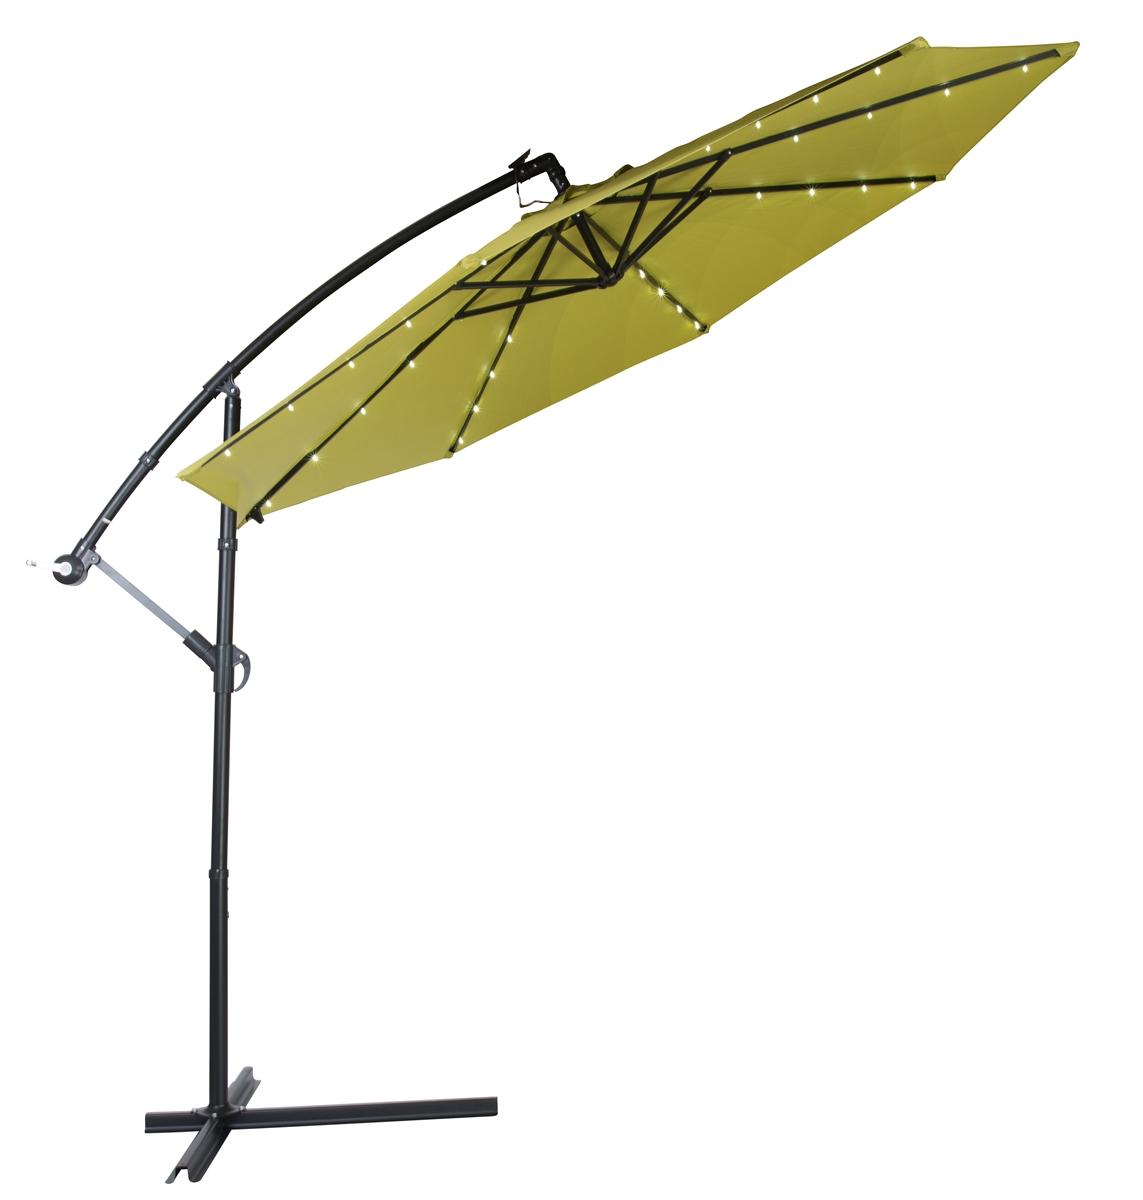 Patio Umbrella Alternative: 10' Deluxe Polyester Offset Patio Umbrella With LED Lights